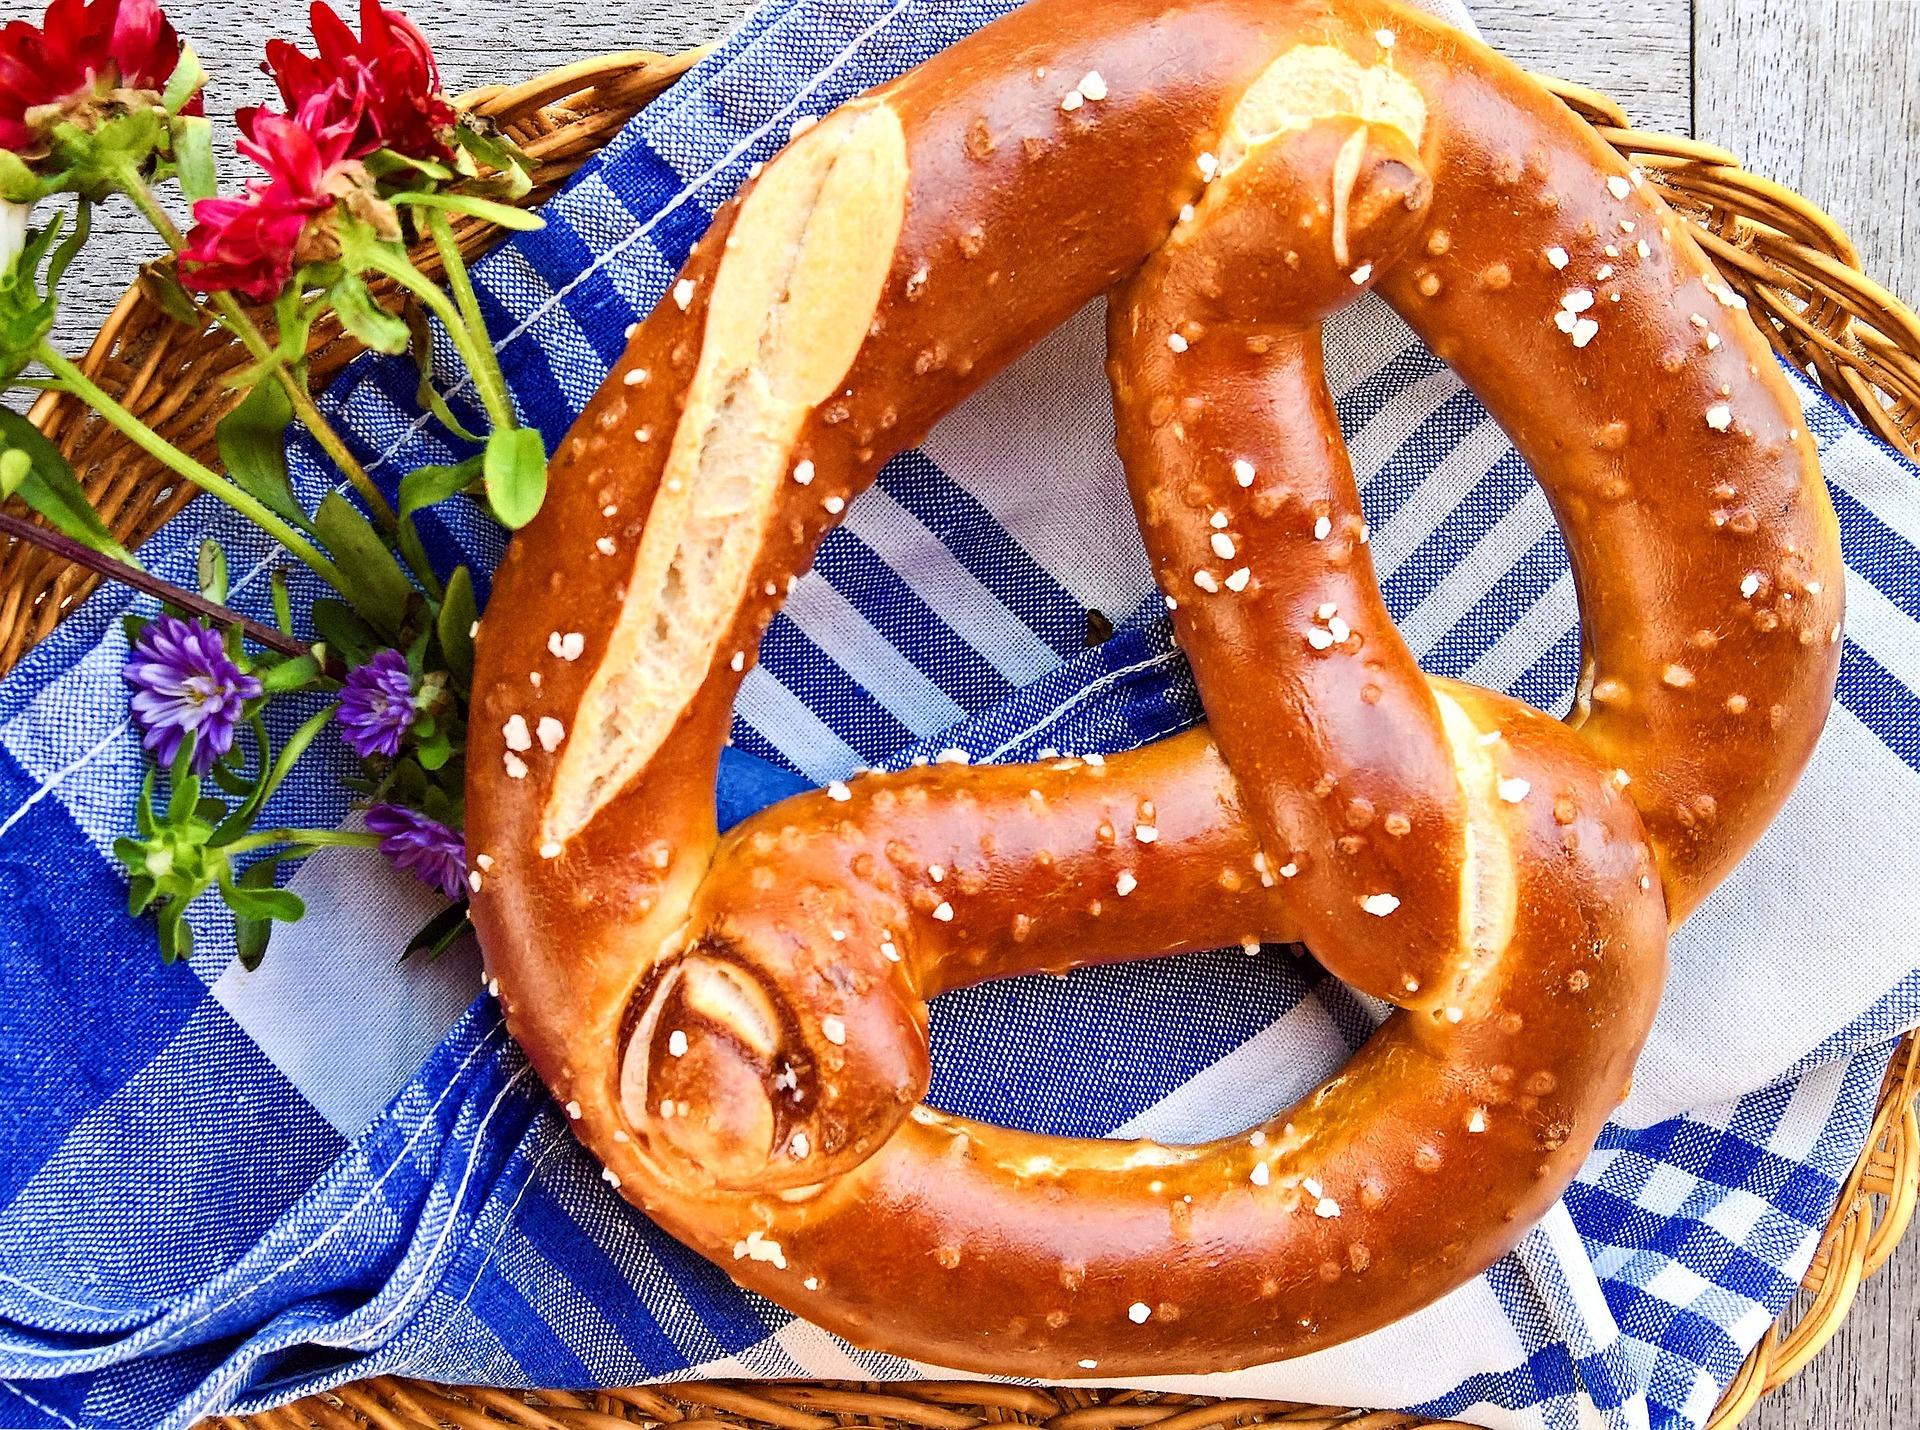 Bretzel, tipico pane della cucina bavarese